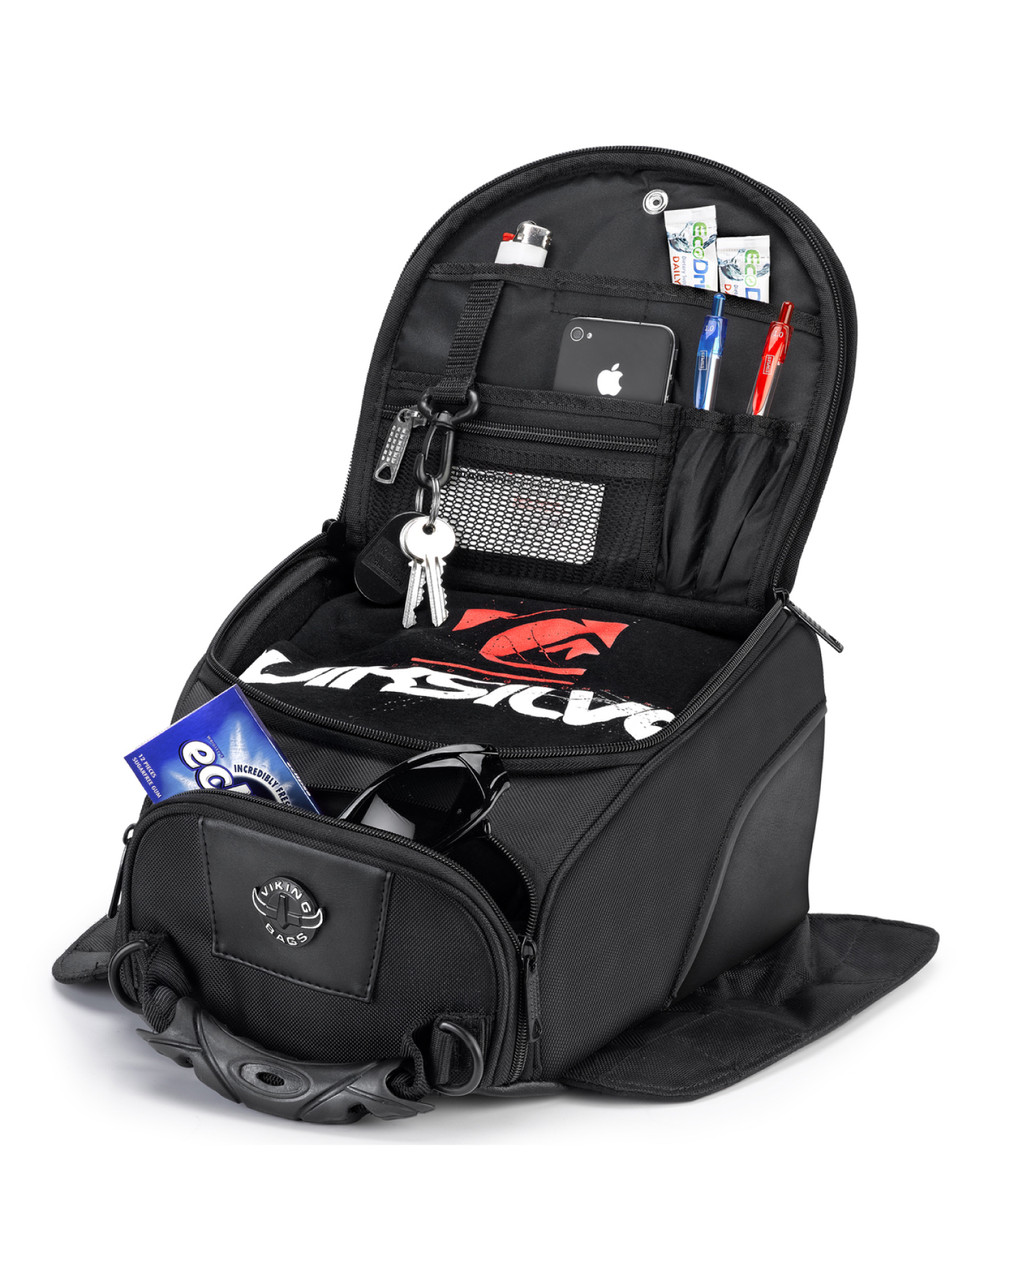 Viking 14 Medium Black Street/Sportbike Tank Bag Storage View